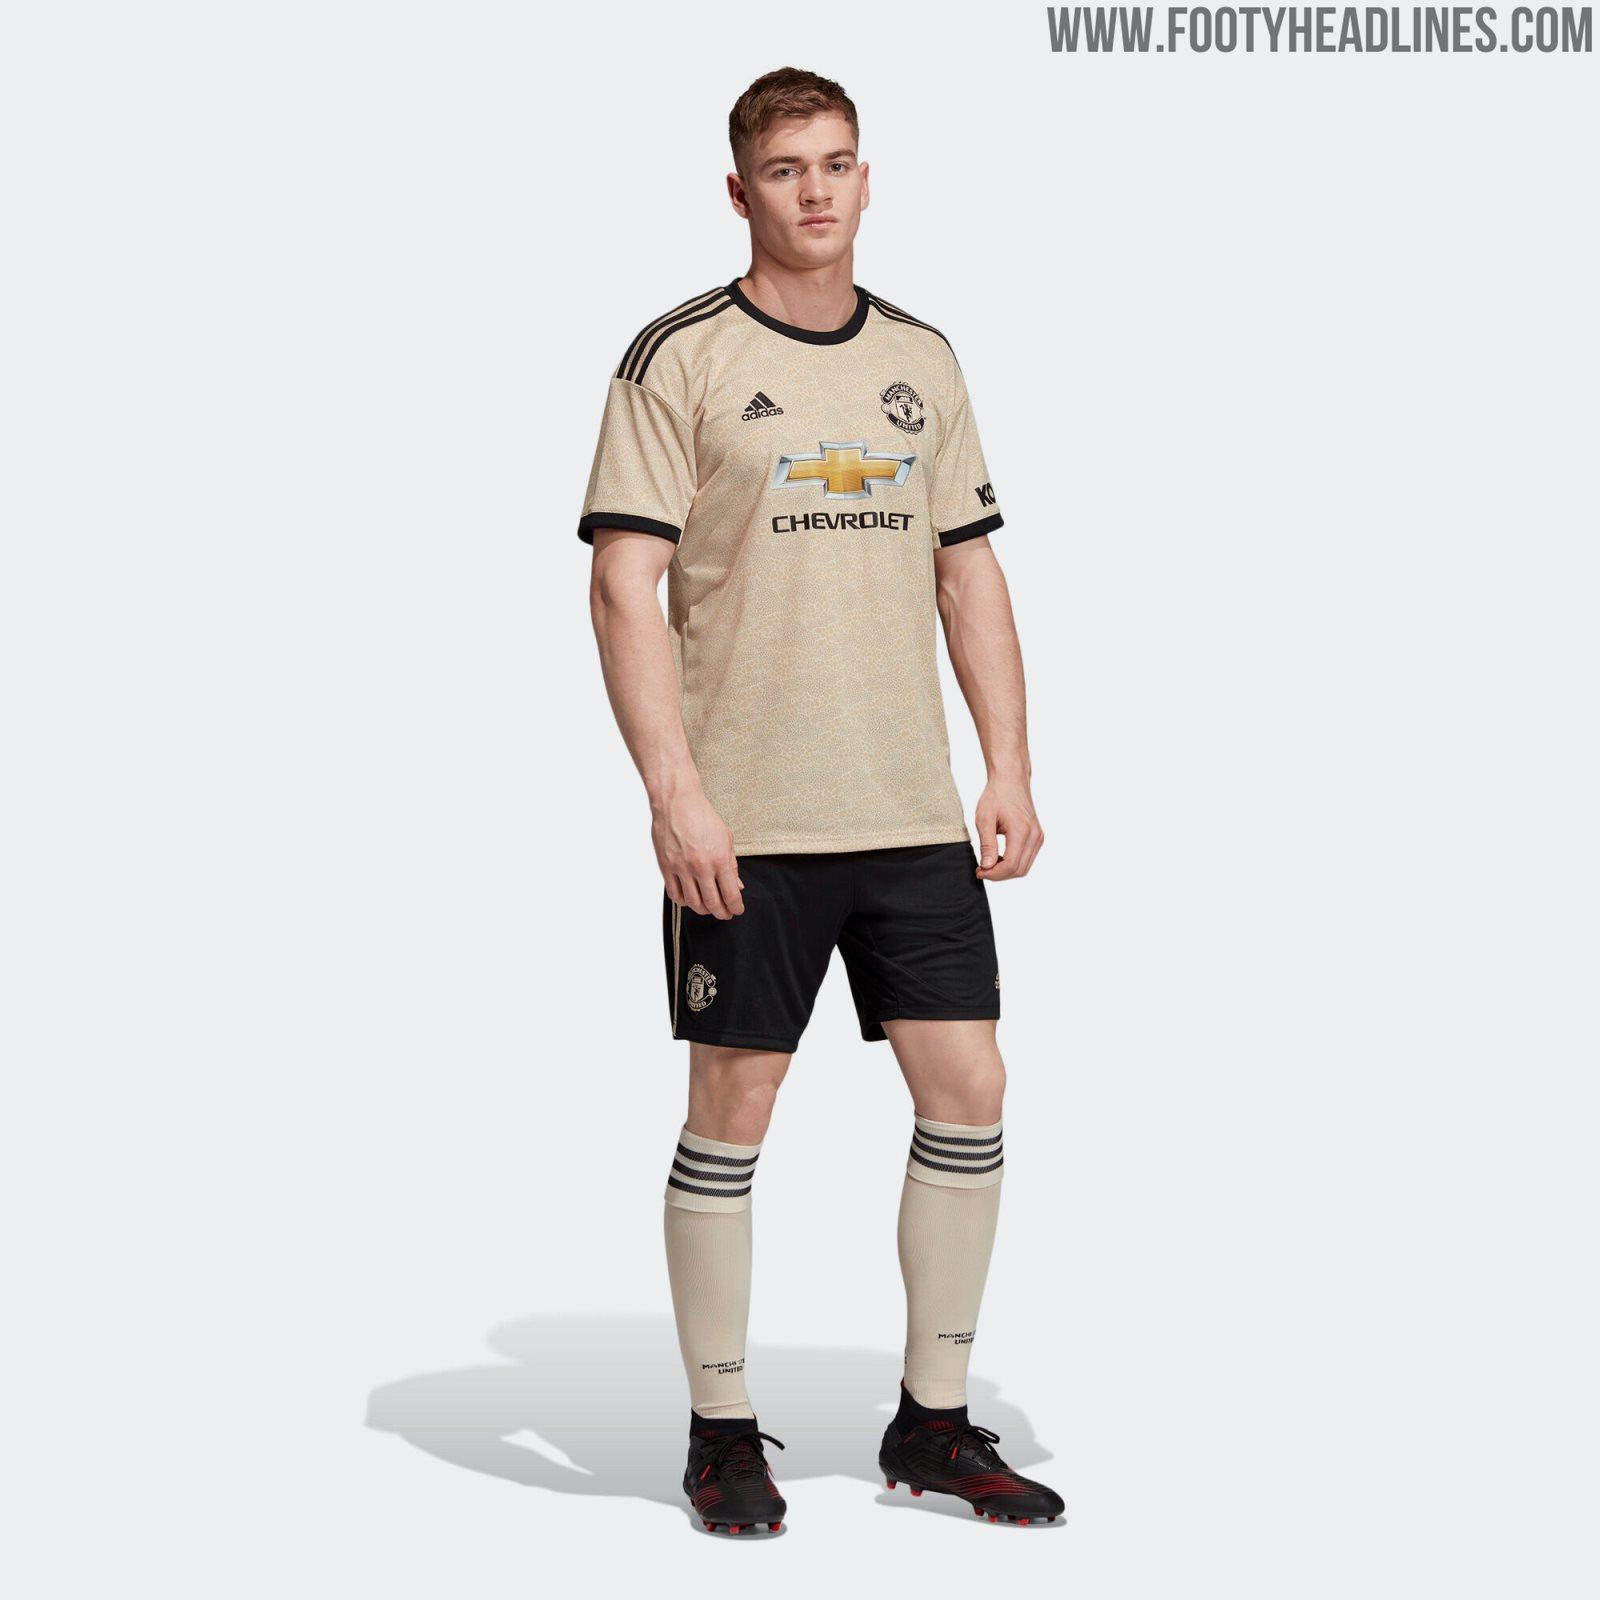 super popular 5228d e7dae Manchester United 19-20 Away Kit Released - Footy Headlines